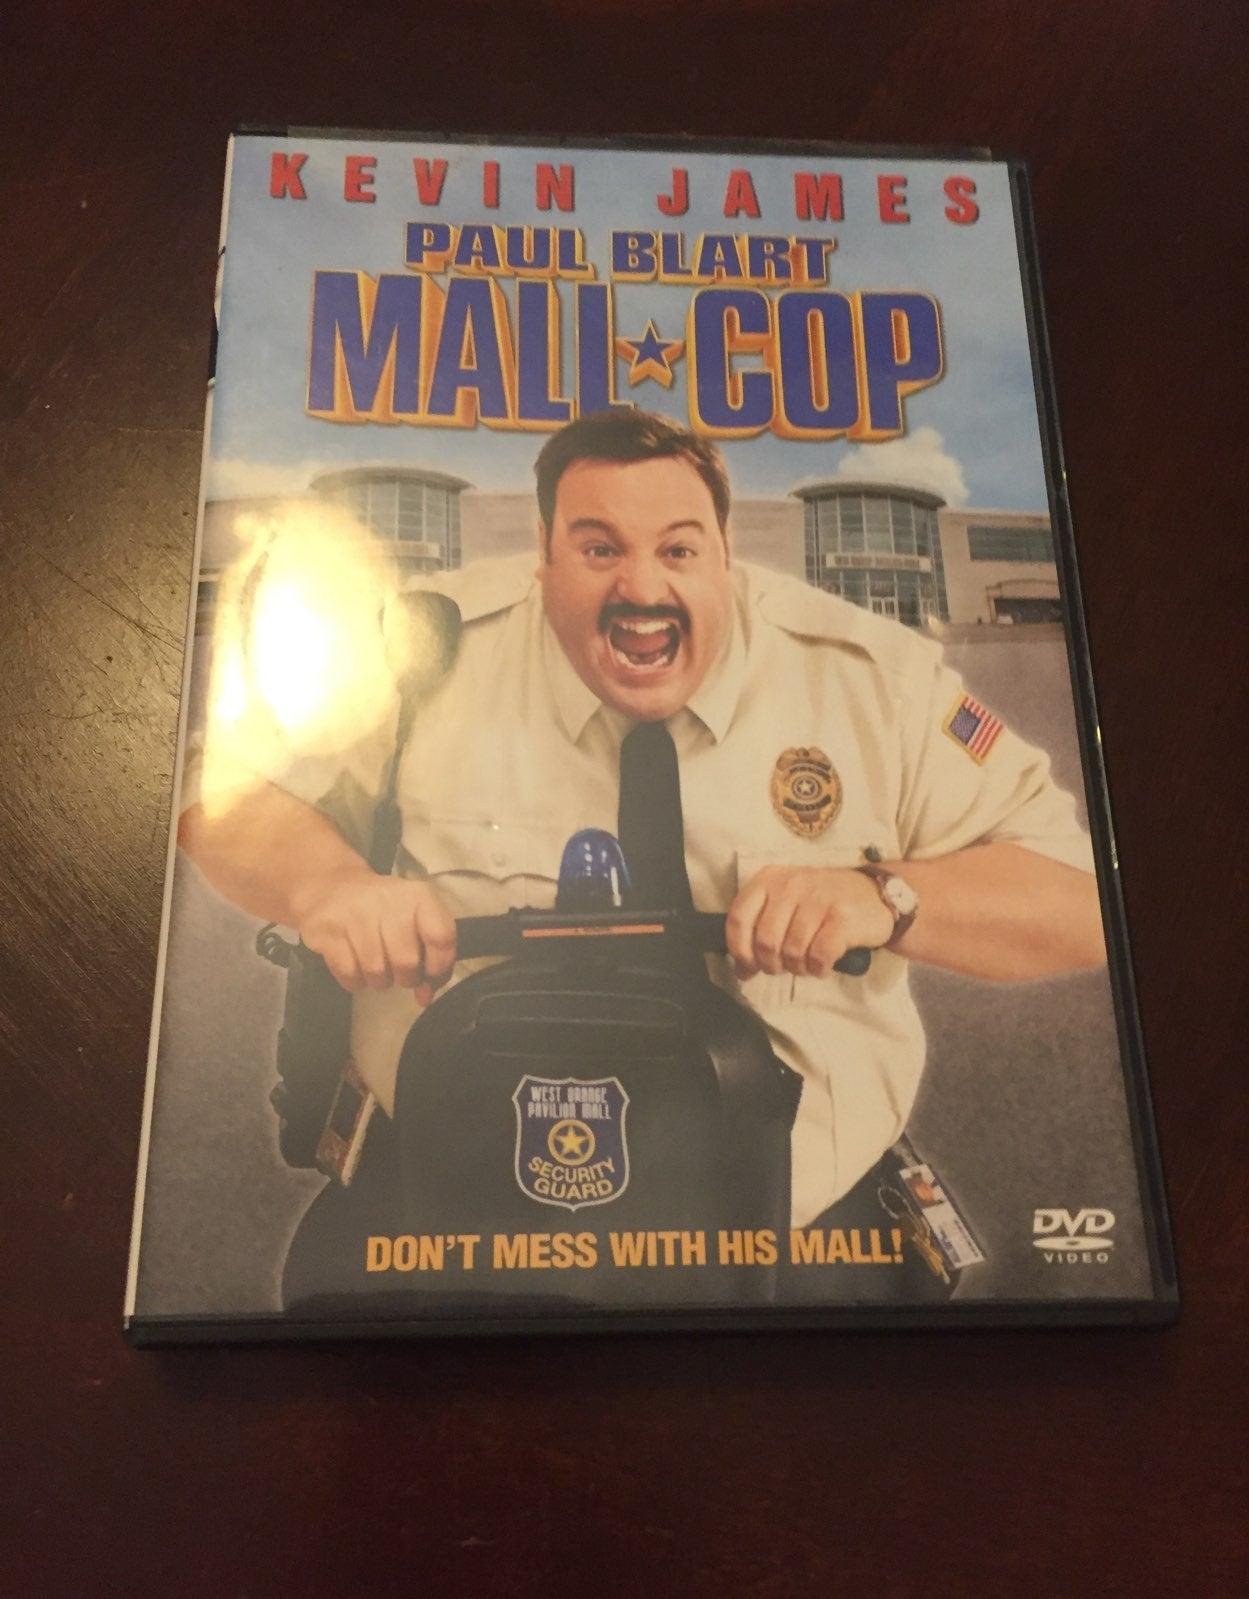 Paul Blart Mall Cop DVD